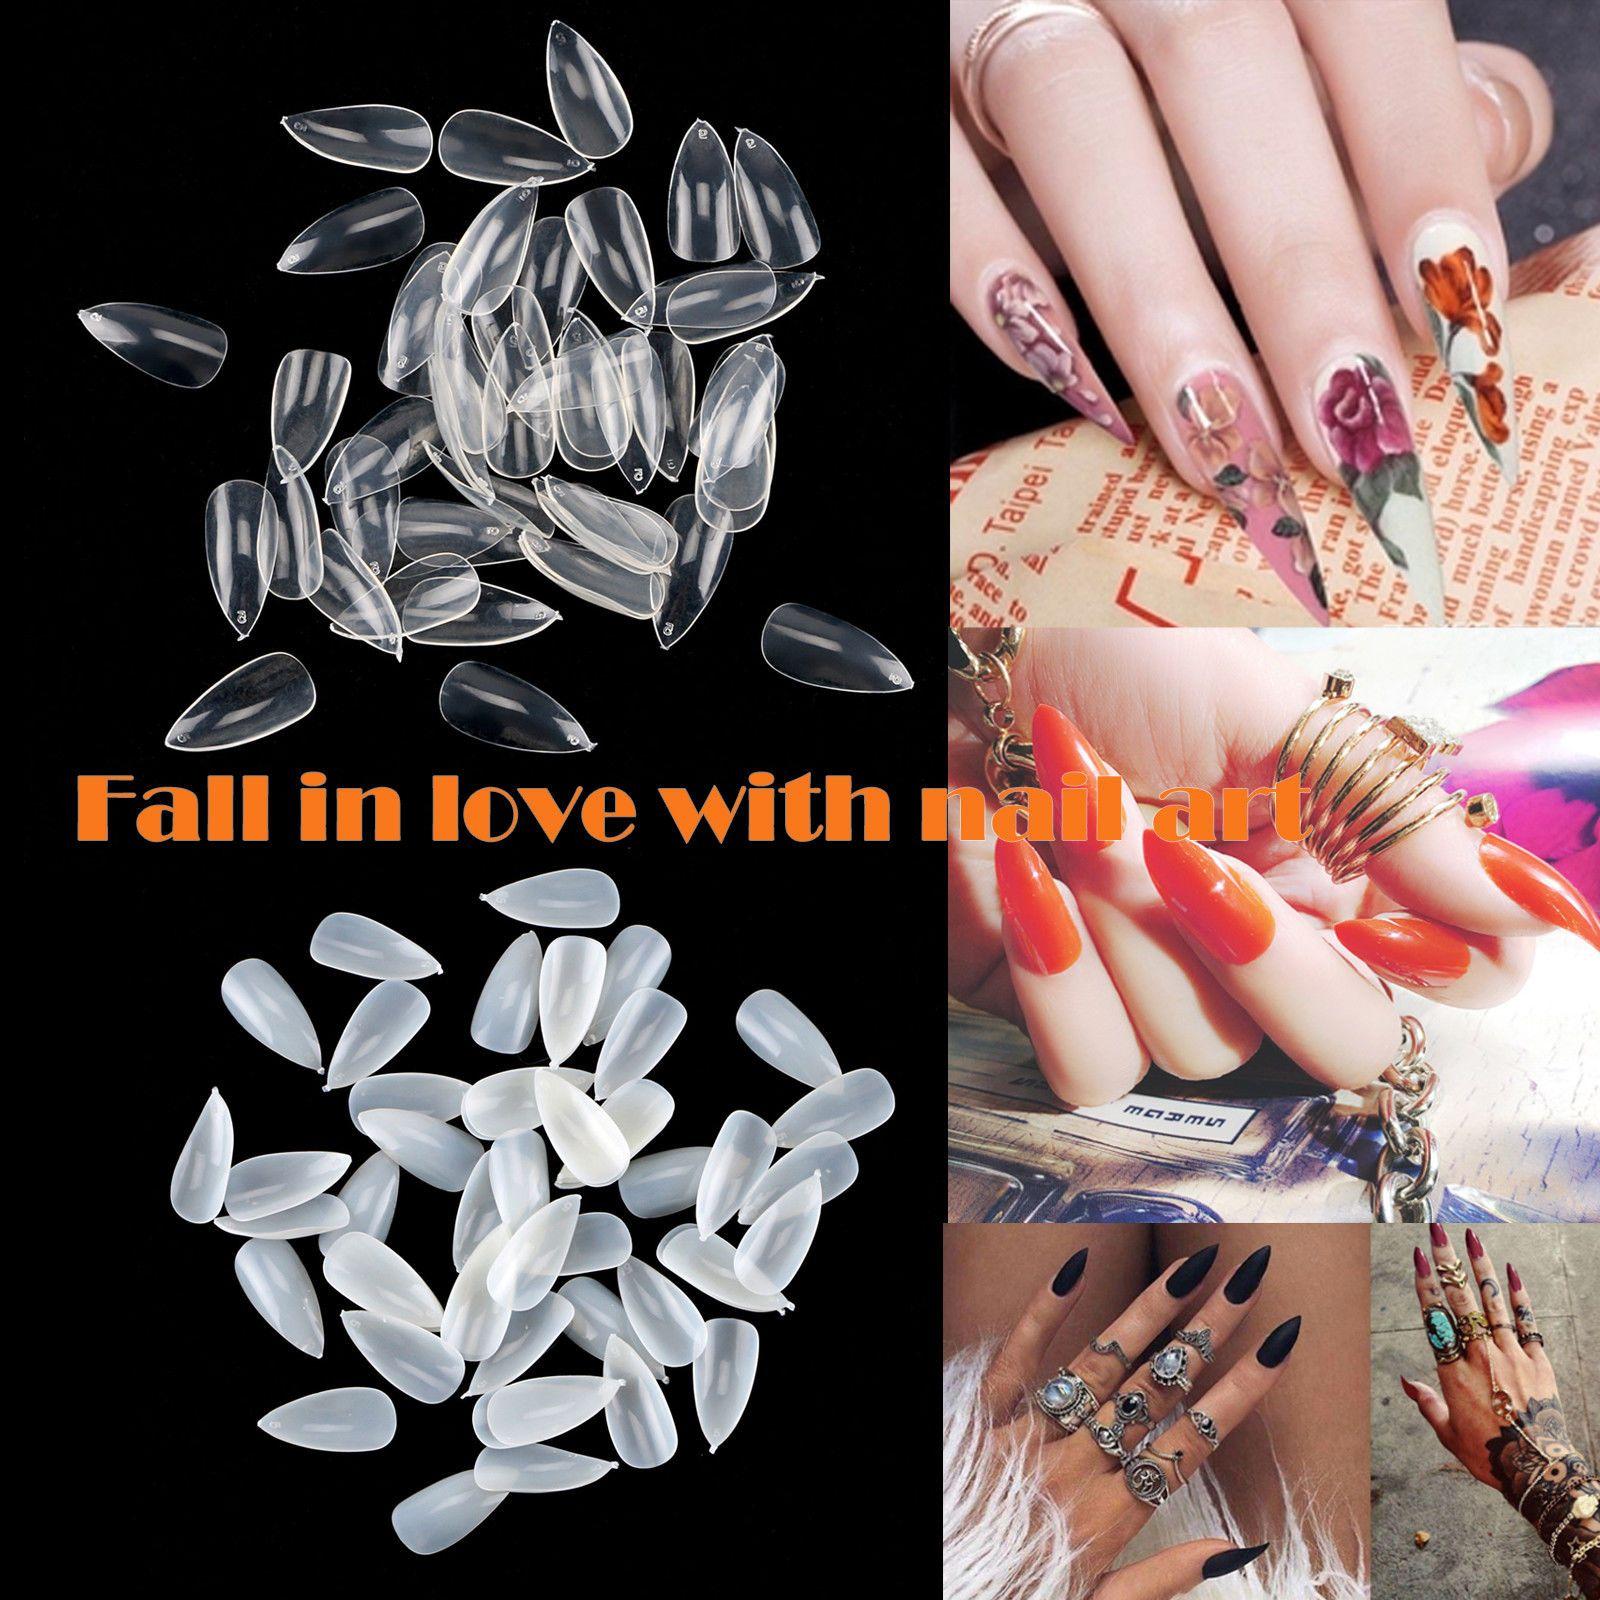 500pc Oval Stiletto Pointy Full False Nail Tips Almond Shape Acrylic Gel Claw